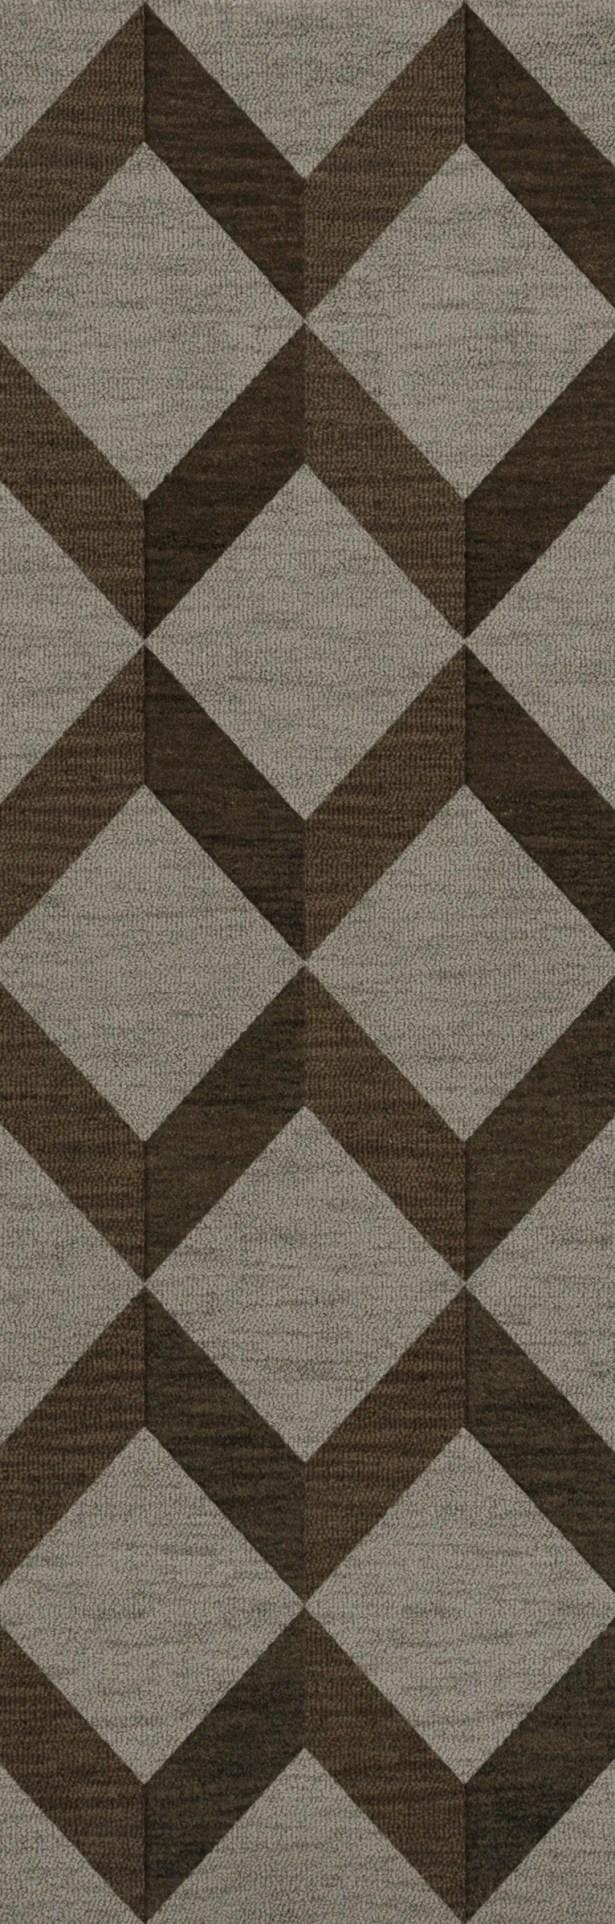 Bella Machine Woven Wool Gray/Brown Area Rug Rug Size: Runner 2'6